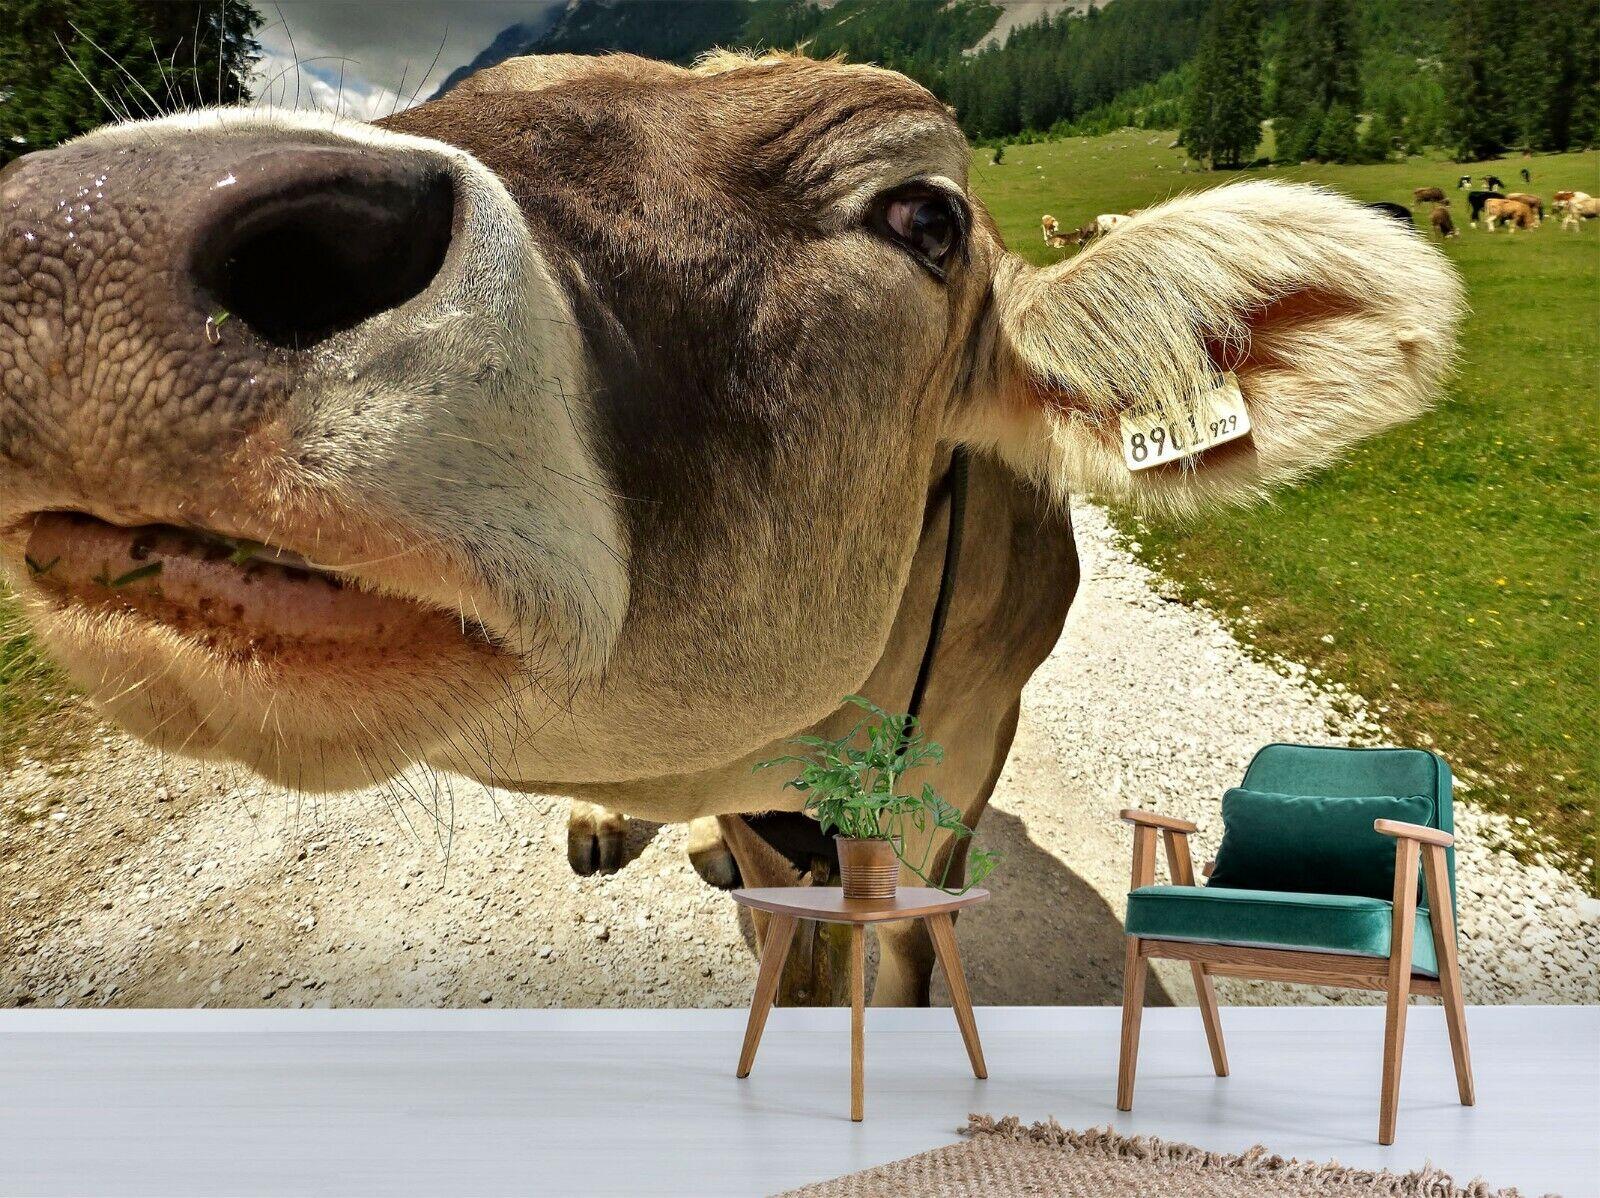 3D Süß Kuh M94 Tier Tapete Wandbild Selbstklebend Abnehmbare Angelia